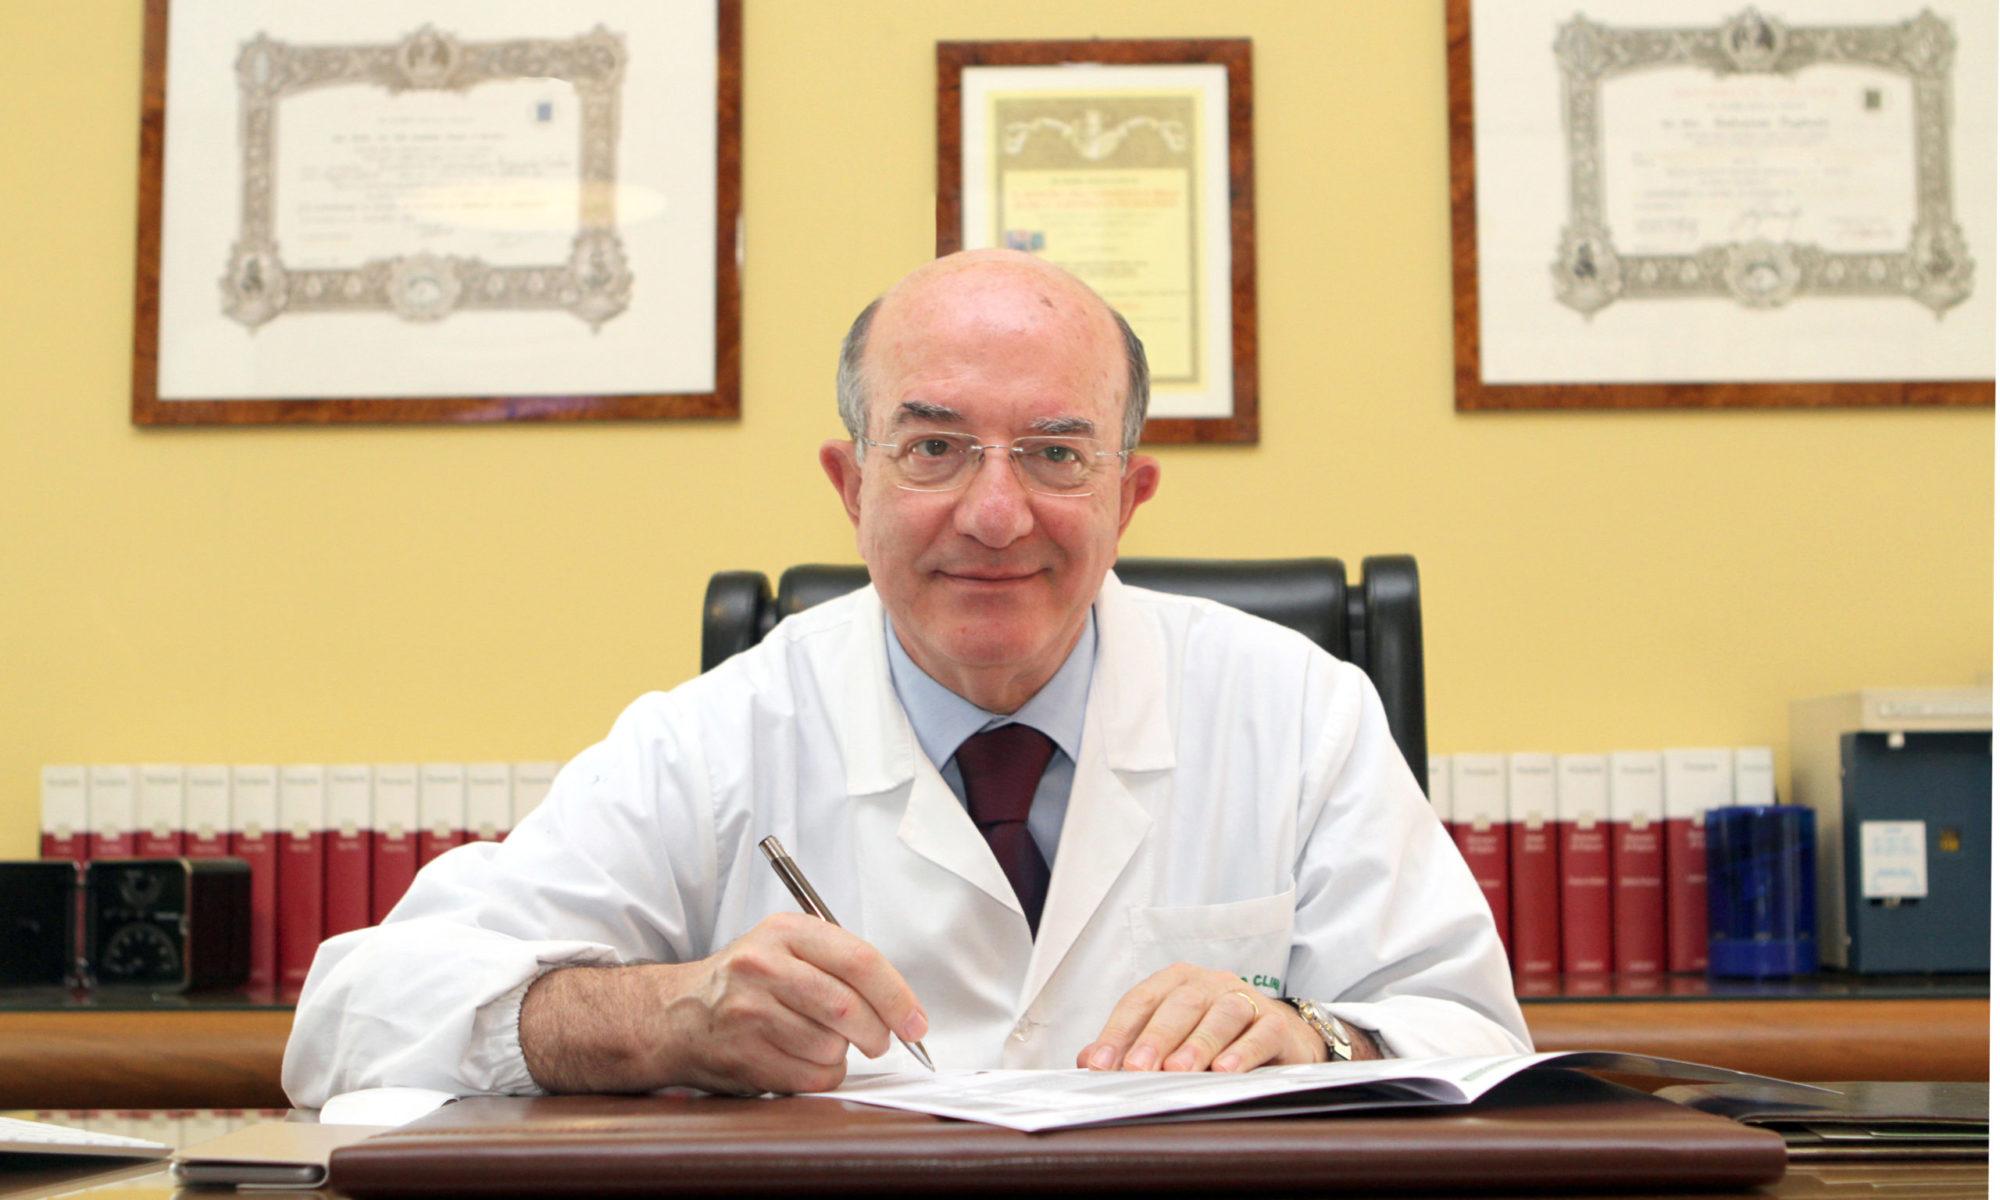 Eduardo Lamberti-Castronuovo